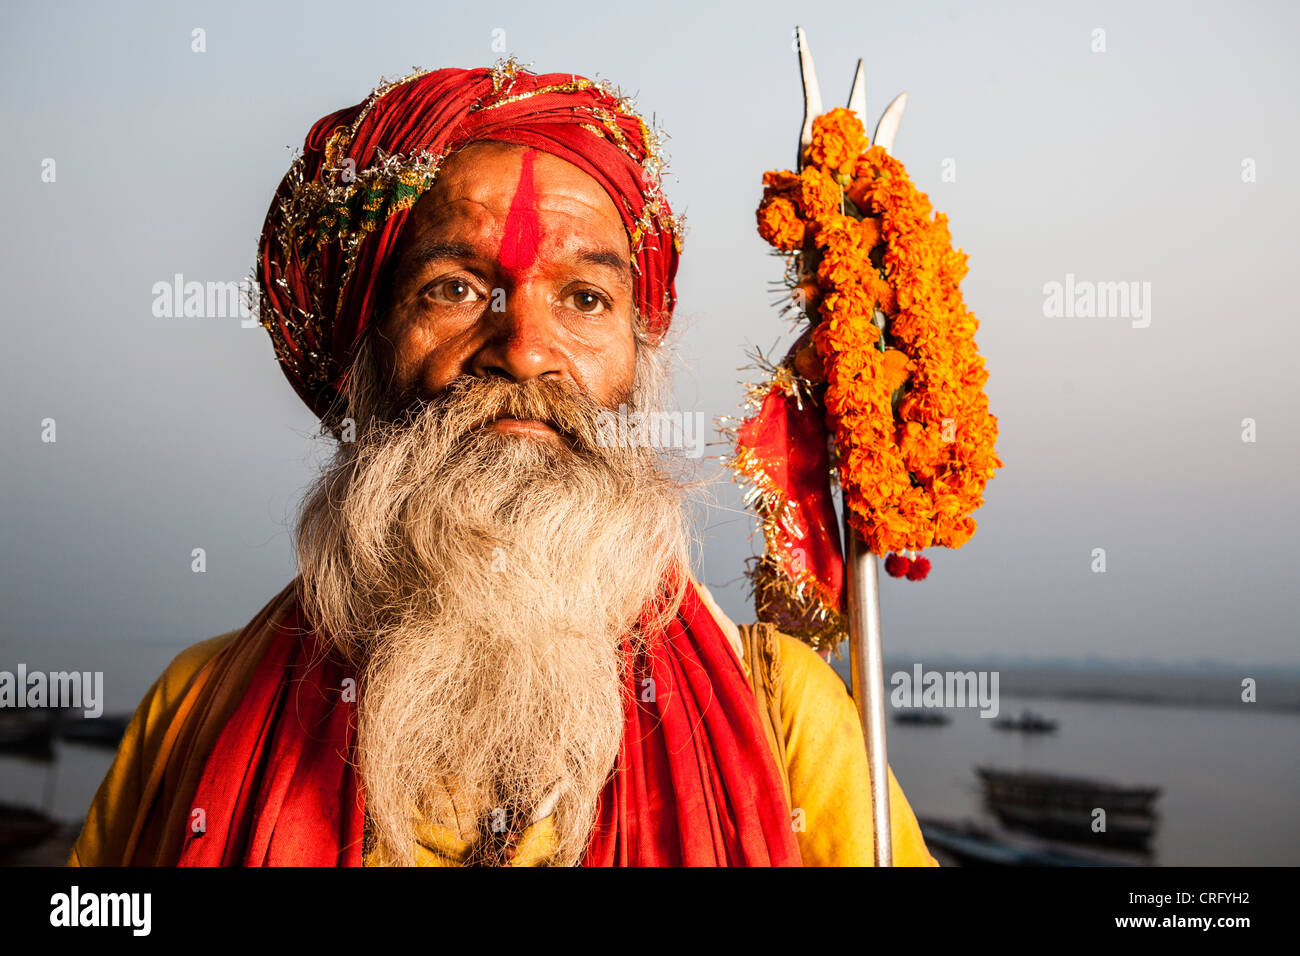 Portrait of Sadhu (holy man), in Varanasi, Uttar Pradesh, India - Stock Image